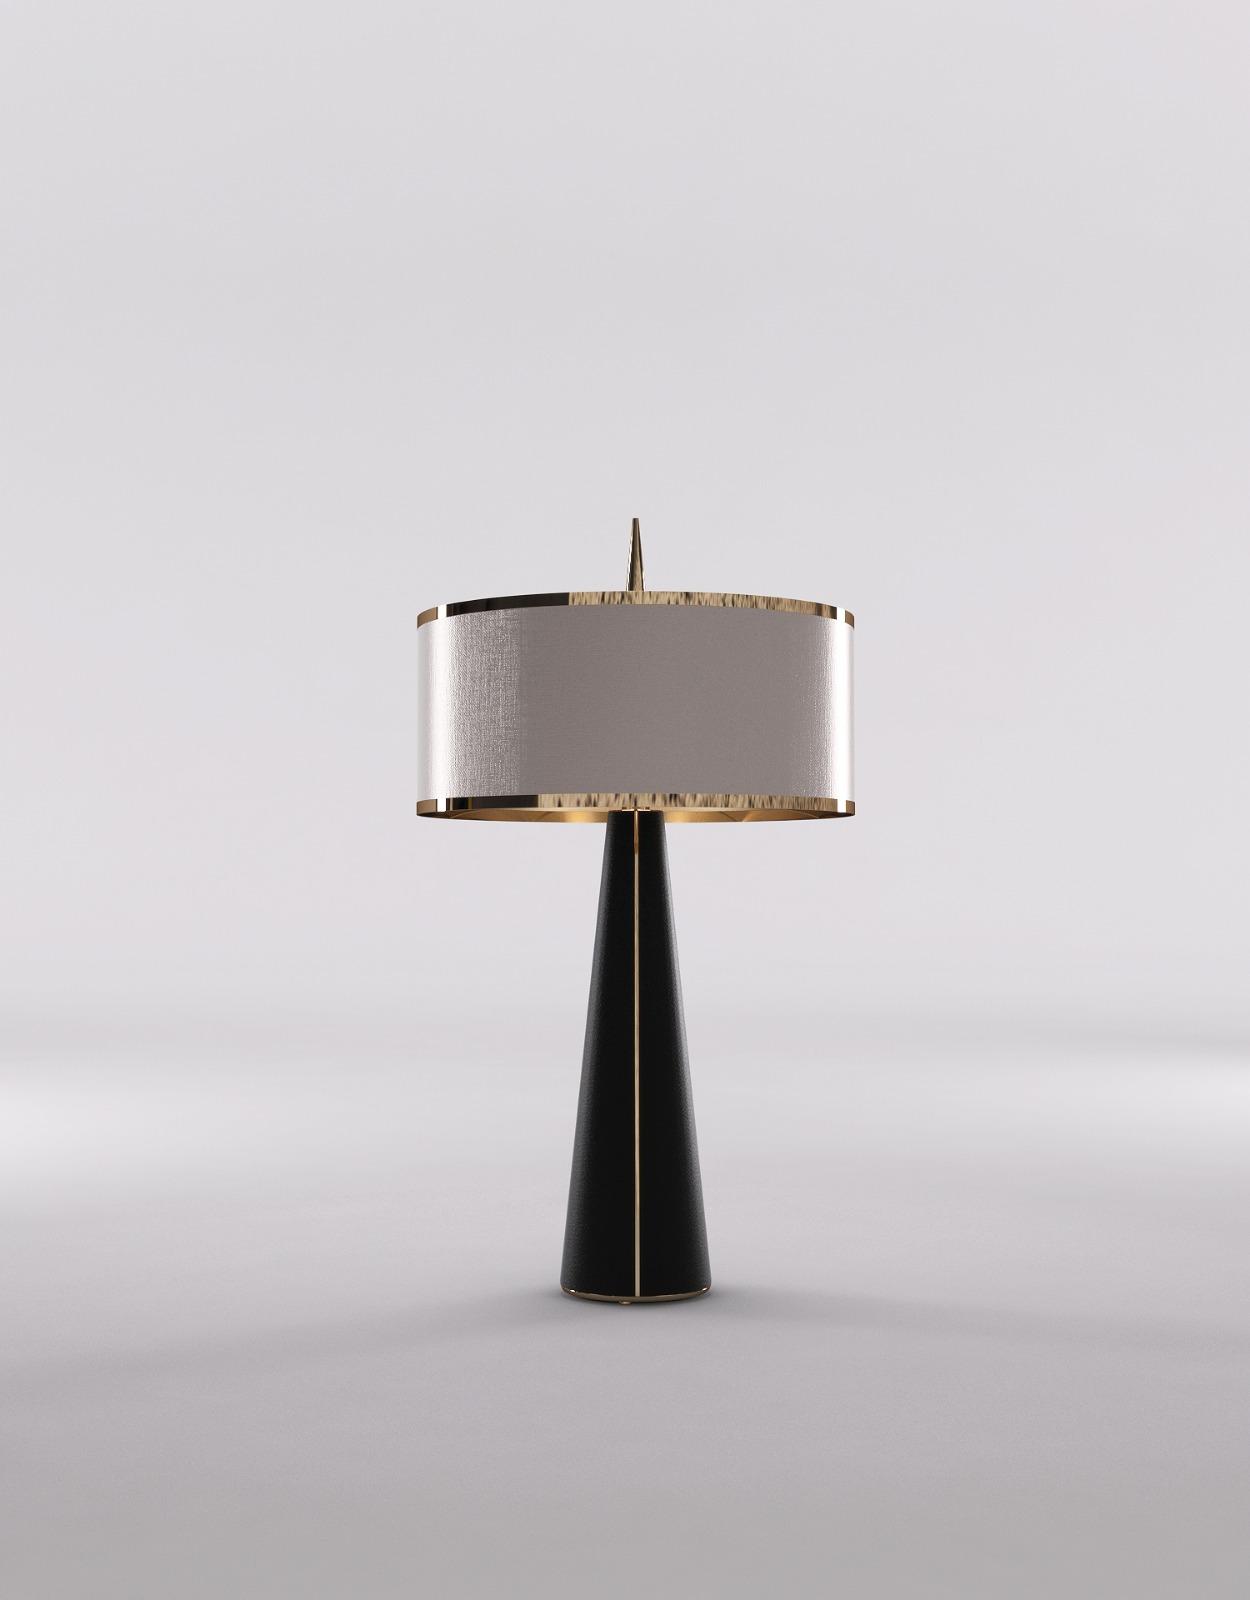 Luxury Furniture: Needle Table Lamp luxury furniture Luxury Furniture: Needle Table Lamp WhatsApp Image 2020 05 04 at 09